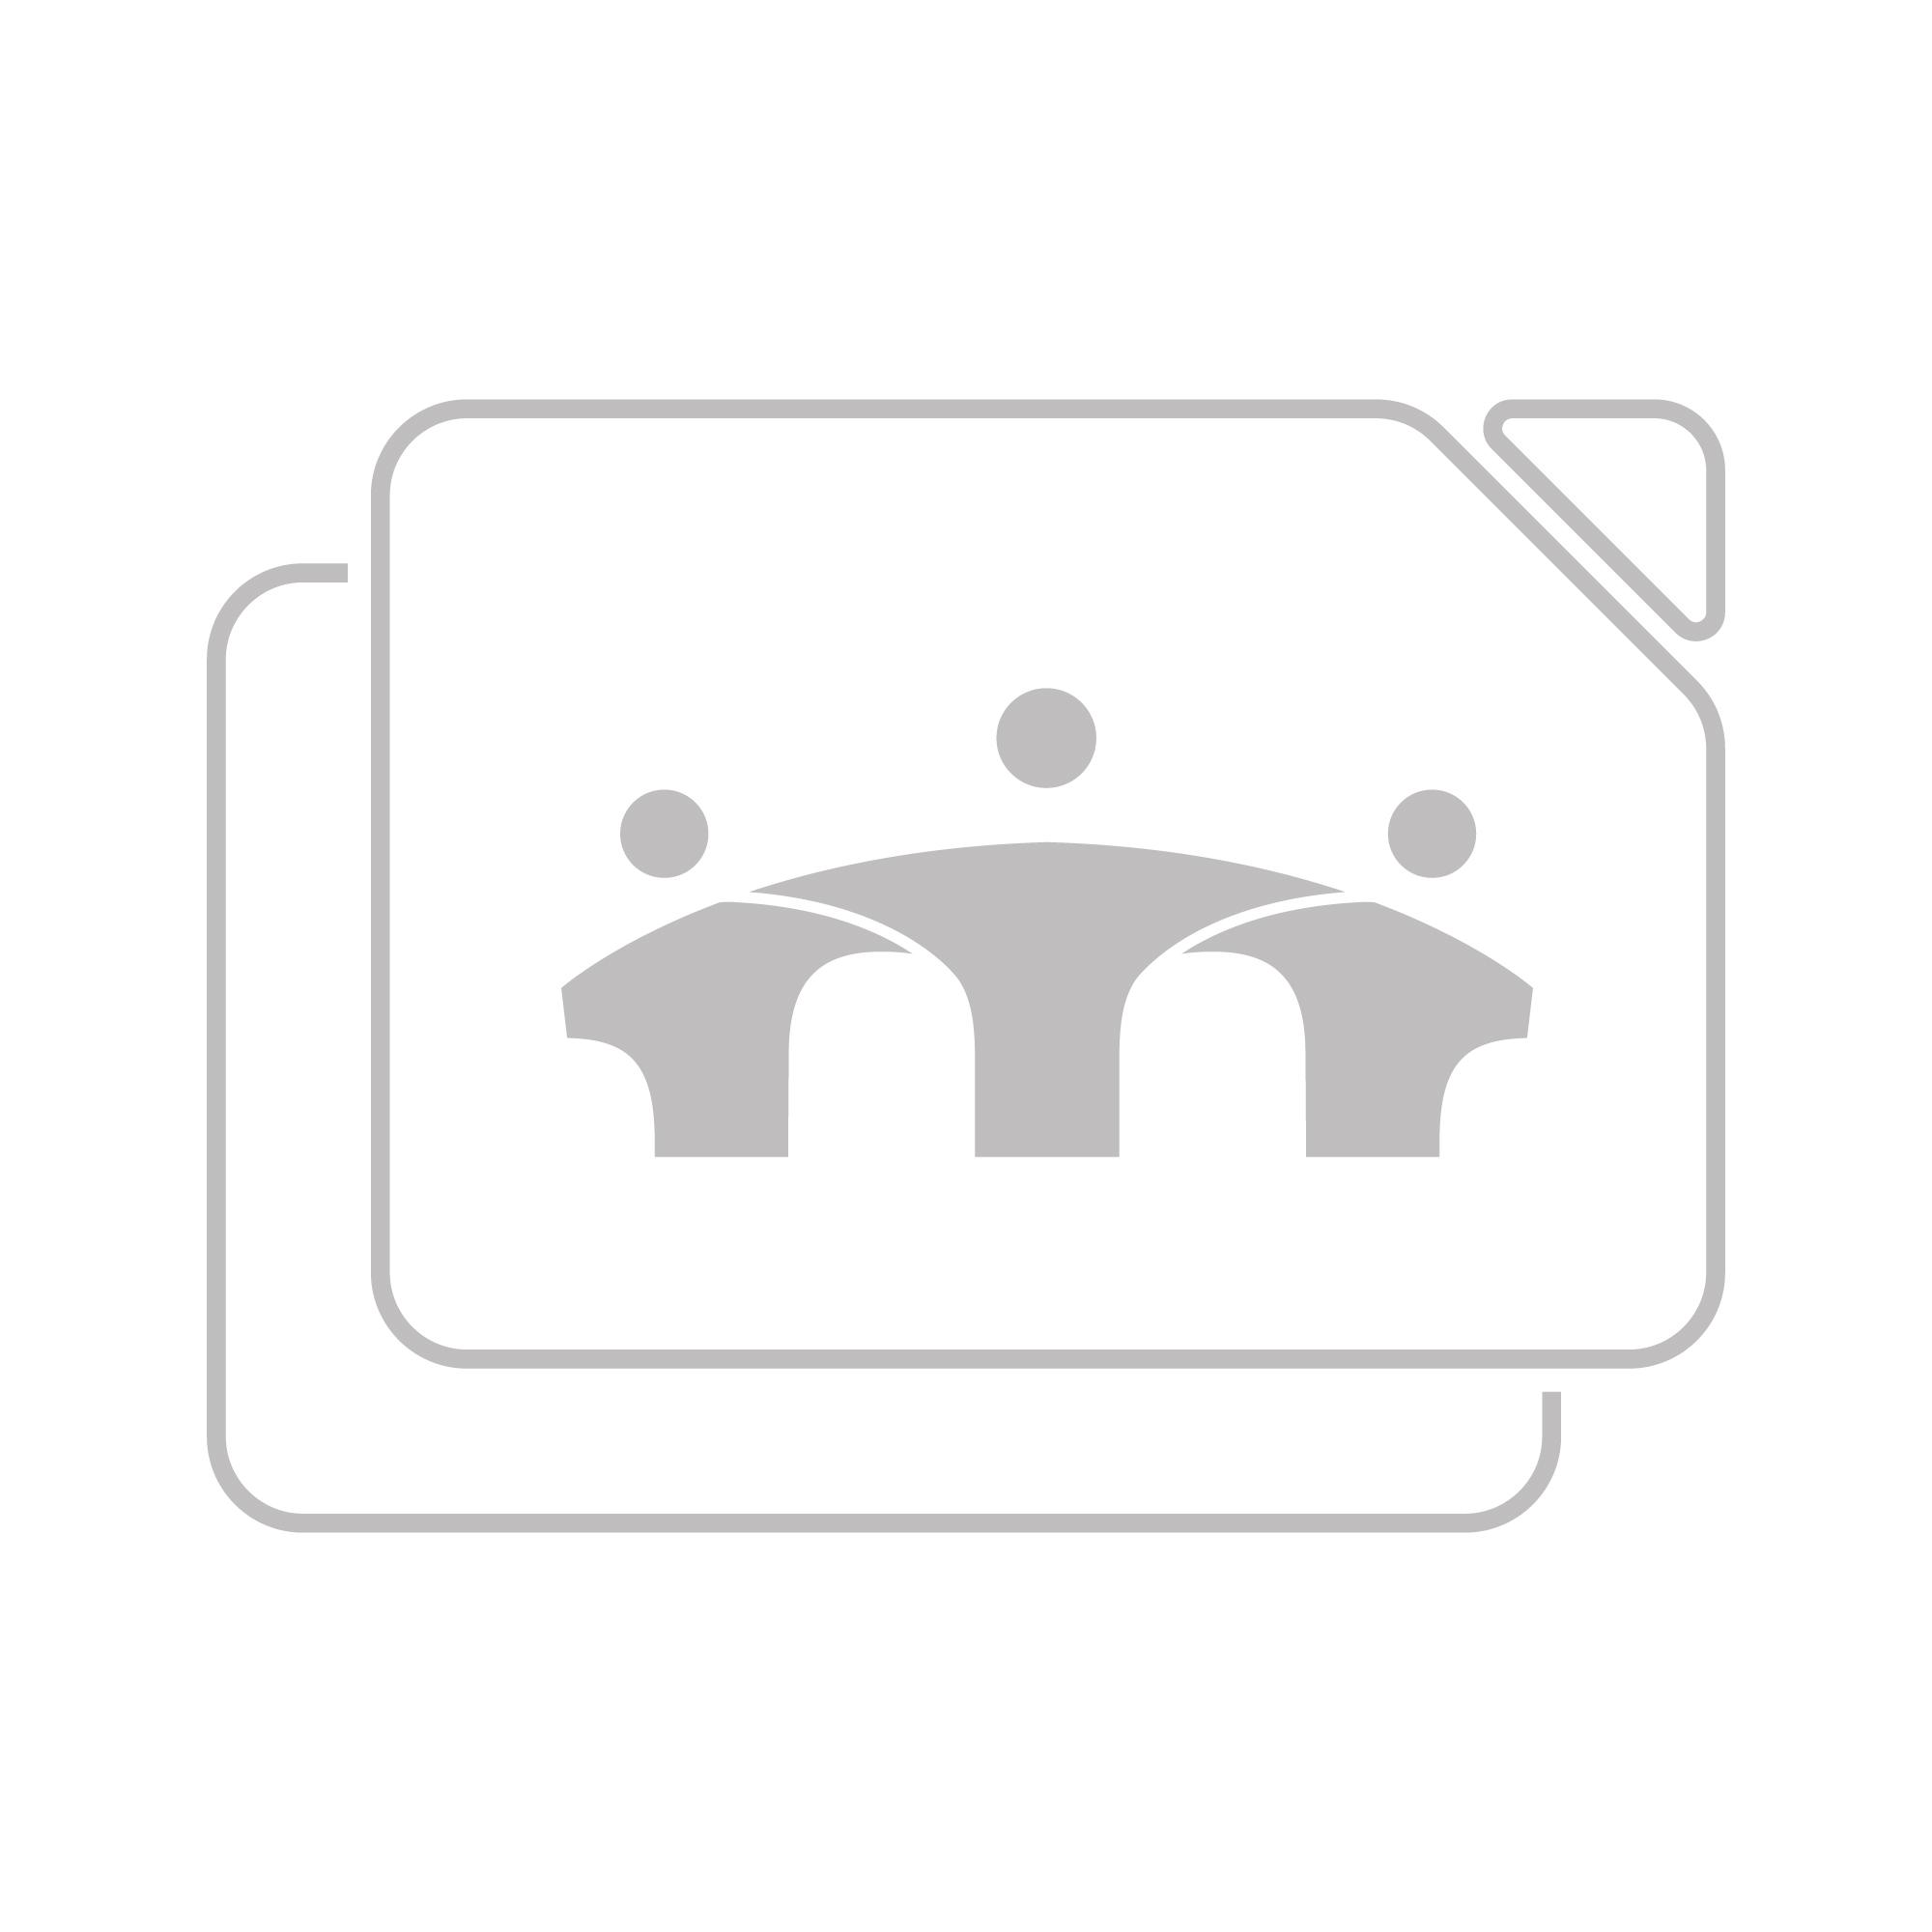 Seagate FireCuda 530 SSD 500GB